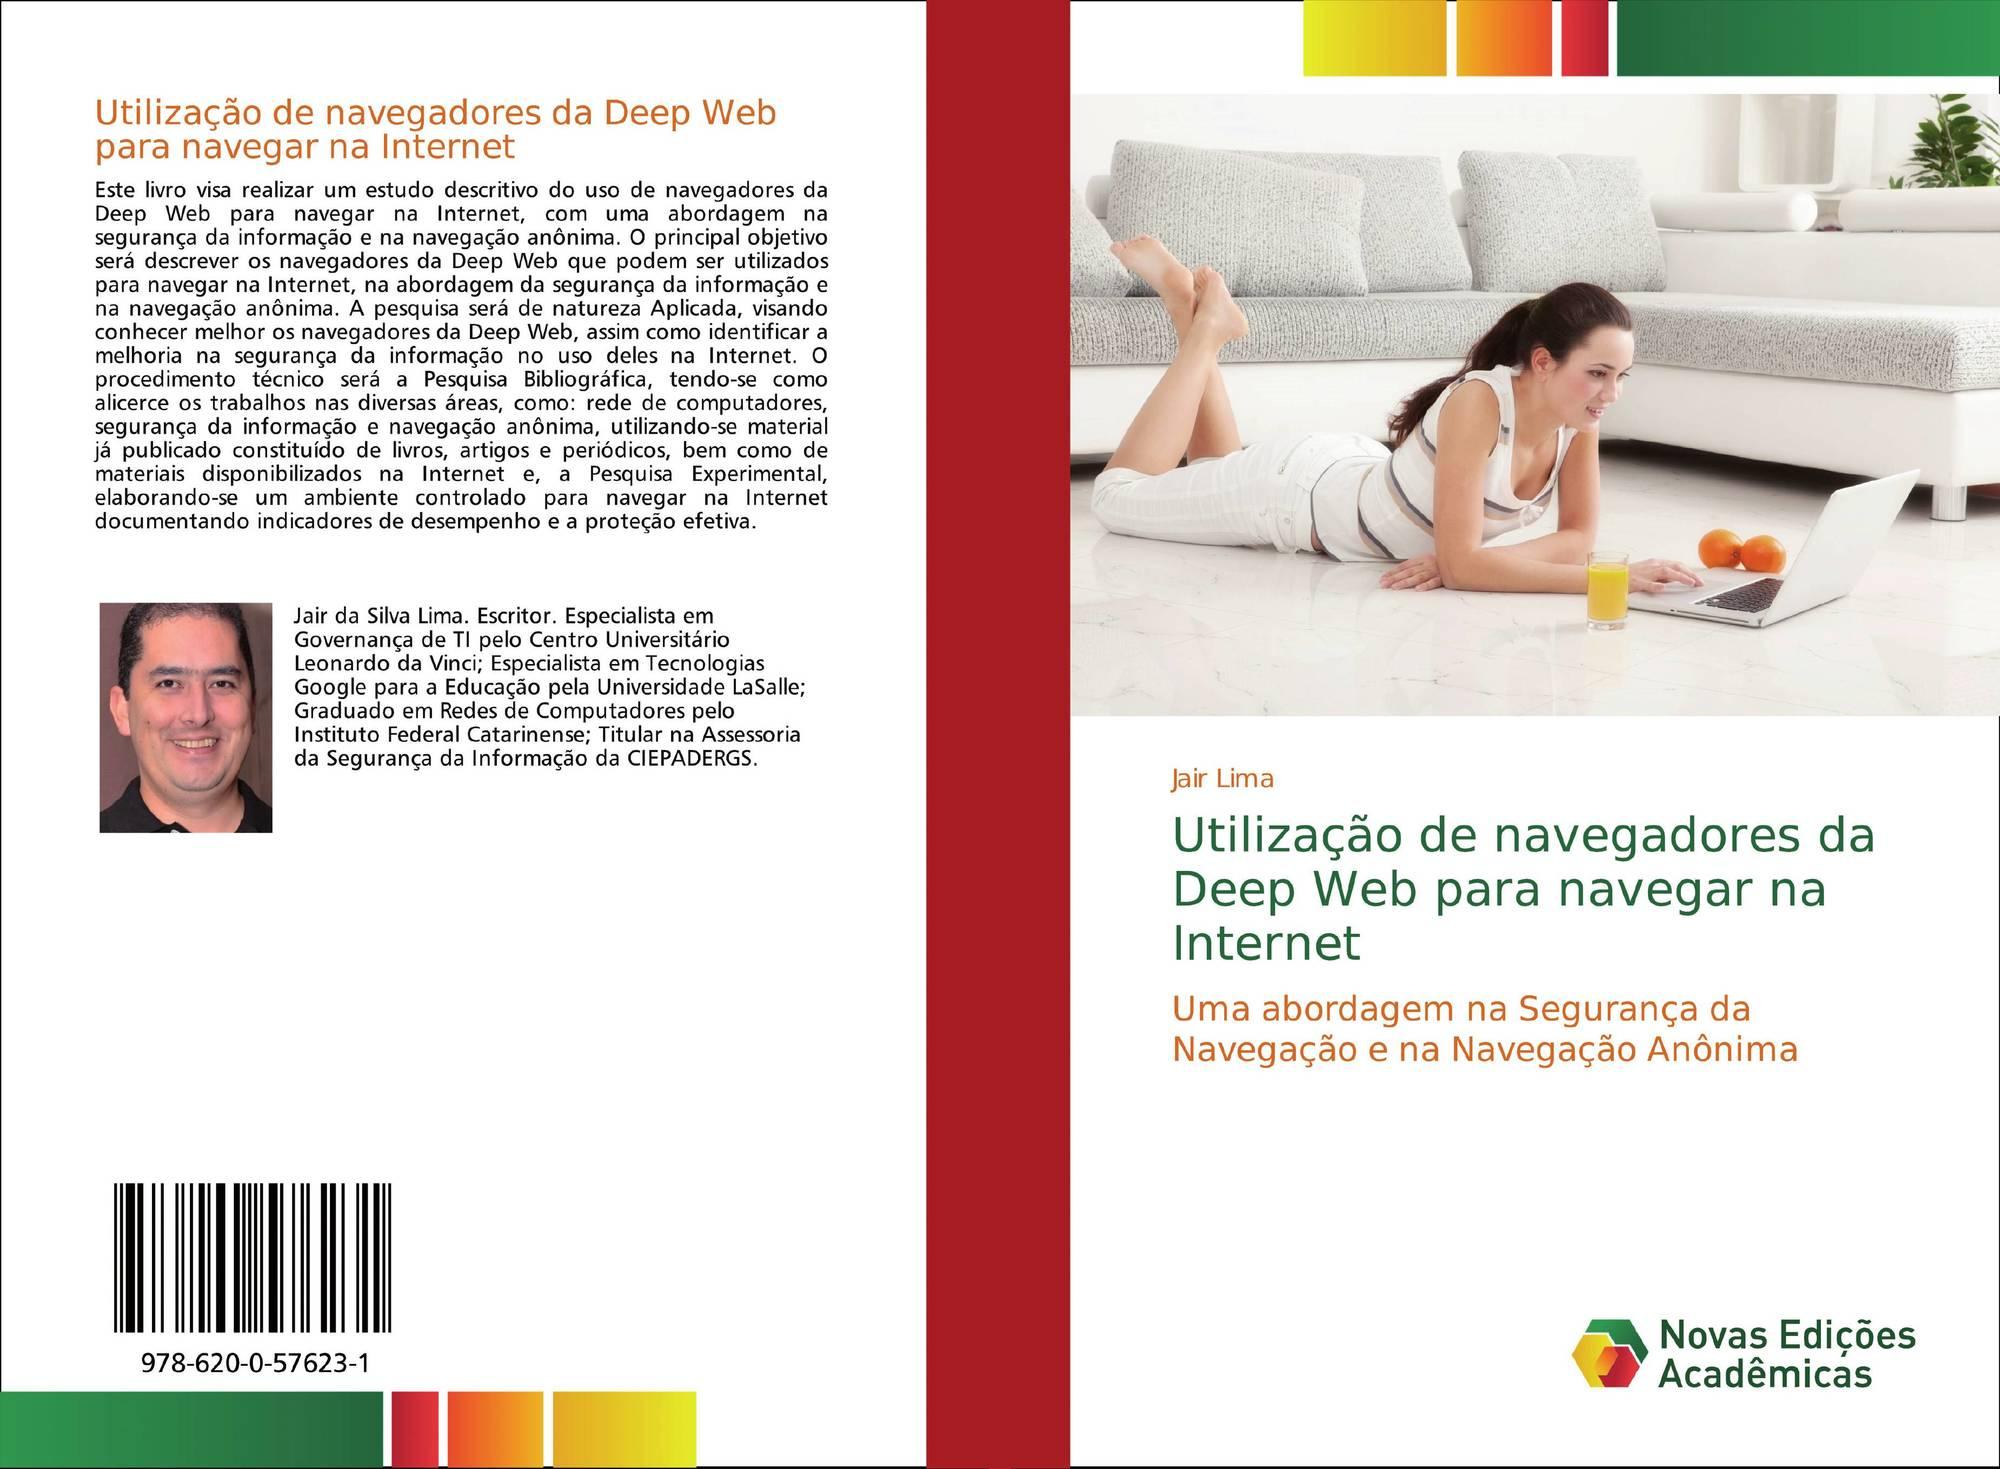 https://www.morebooks.shop/store/gb/book/utiliza%C3%A7%C3%A3o-de-navegadores-da-deep-web-para-navegar-na-internet/isbn/978-620-0-57623-1